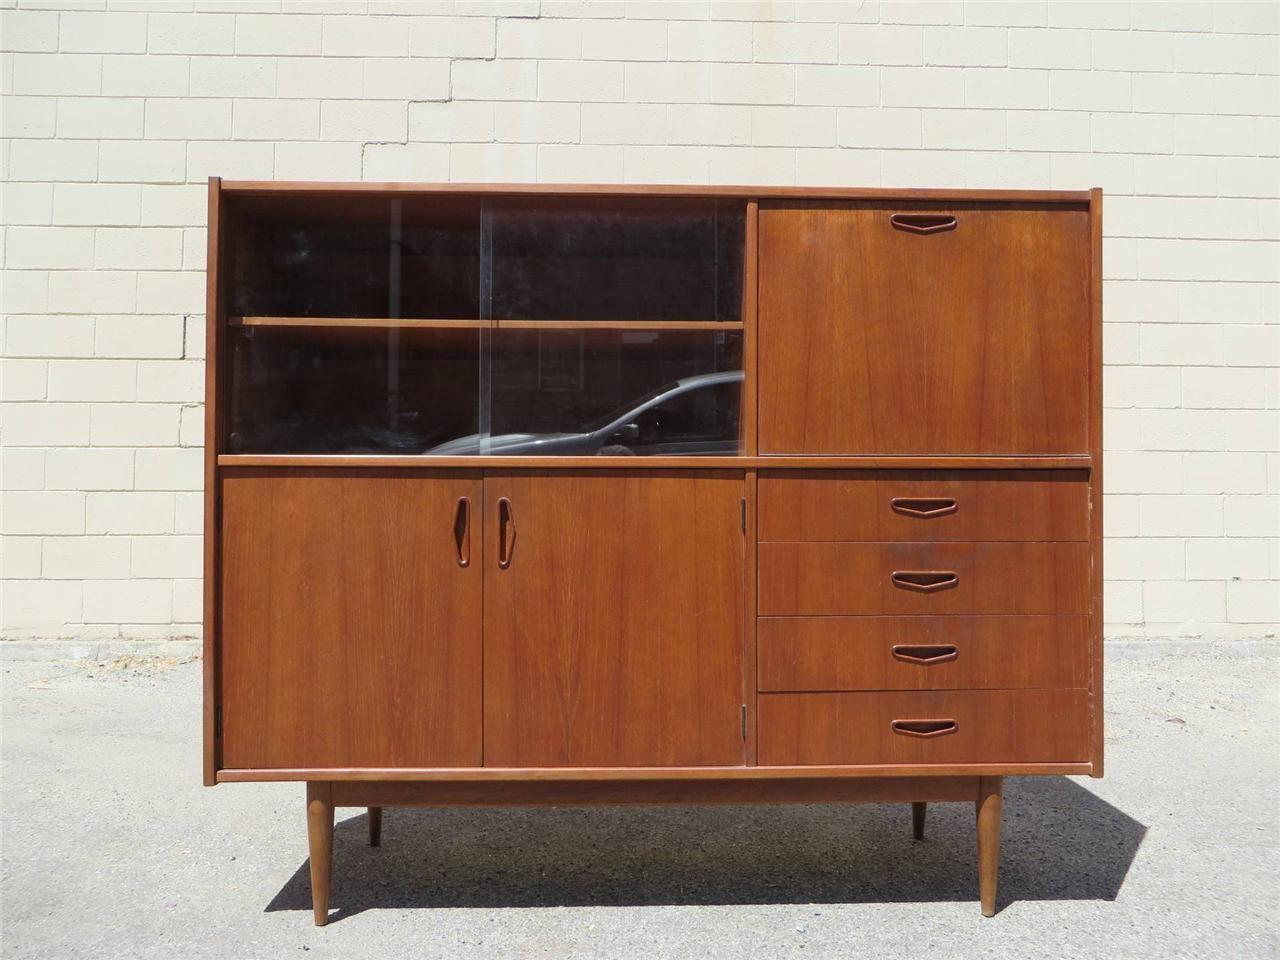 "RETRO 1960's SIDEBOARD DISPLAY DRINKS CABINET""PARKER ERA"" fab furniture Pinterest Drinks"